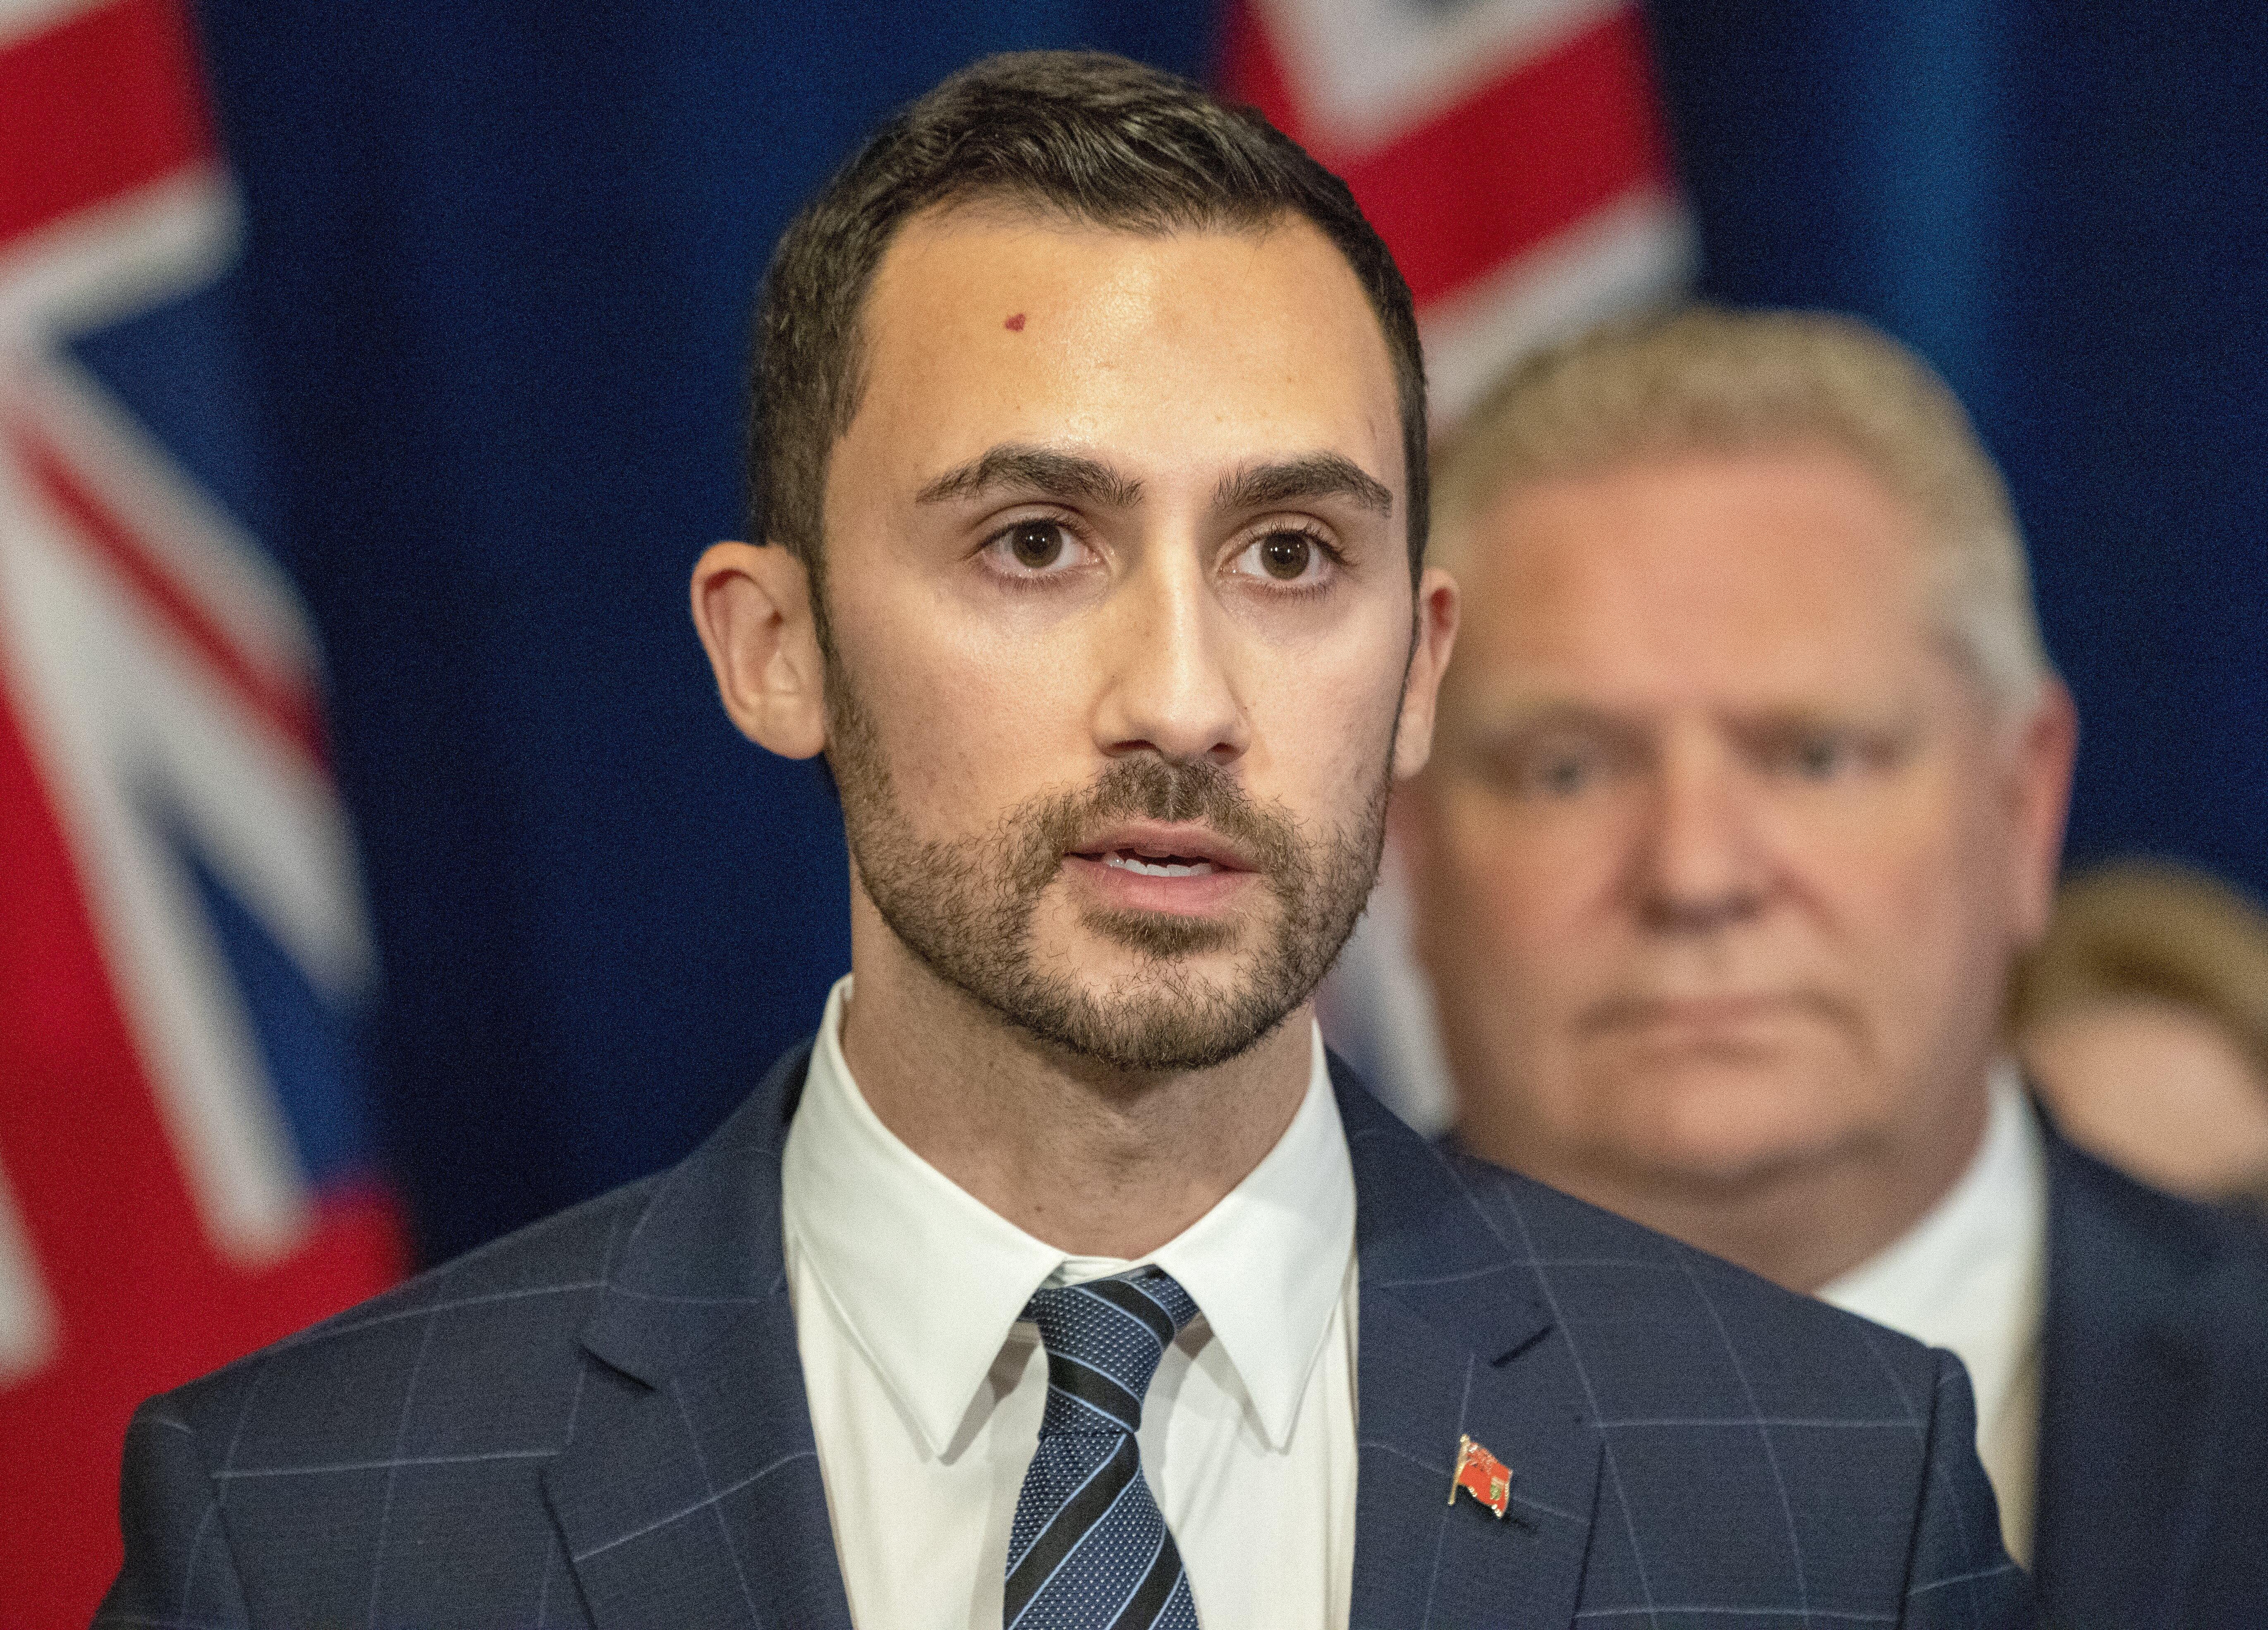 Ontario Public Schools Outline Plan To Begin Teaching Kids Online